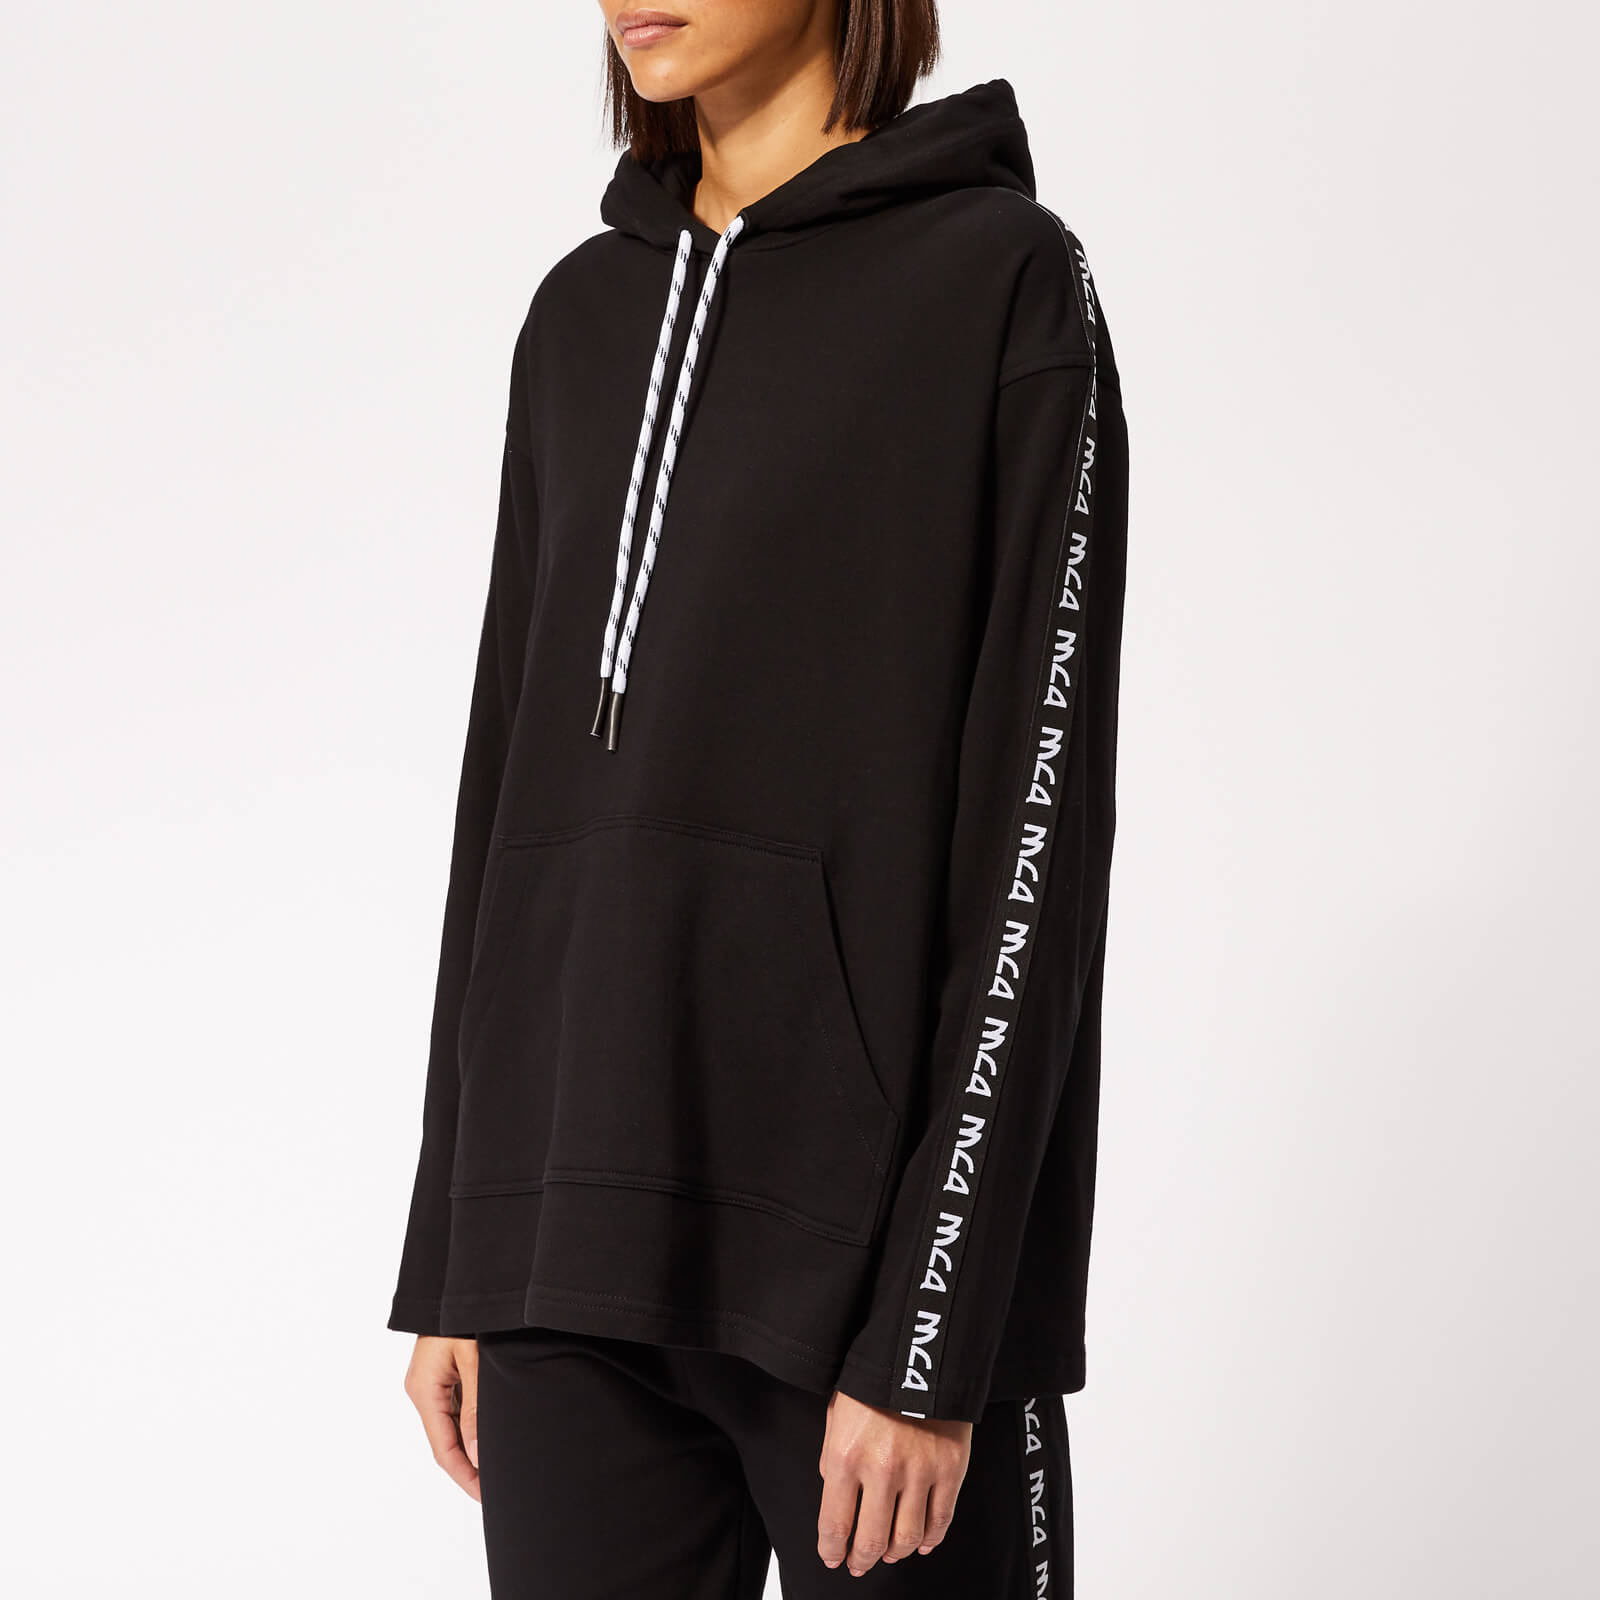 213c02c3 McQ Alexander McQueen Women's Ribless Hoody - Darkest Black - Free UK  Delivery over £50